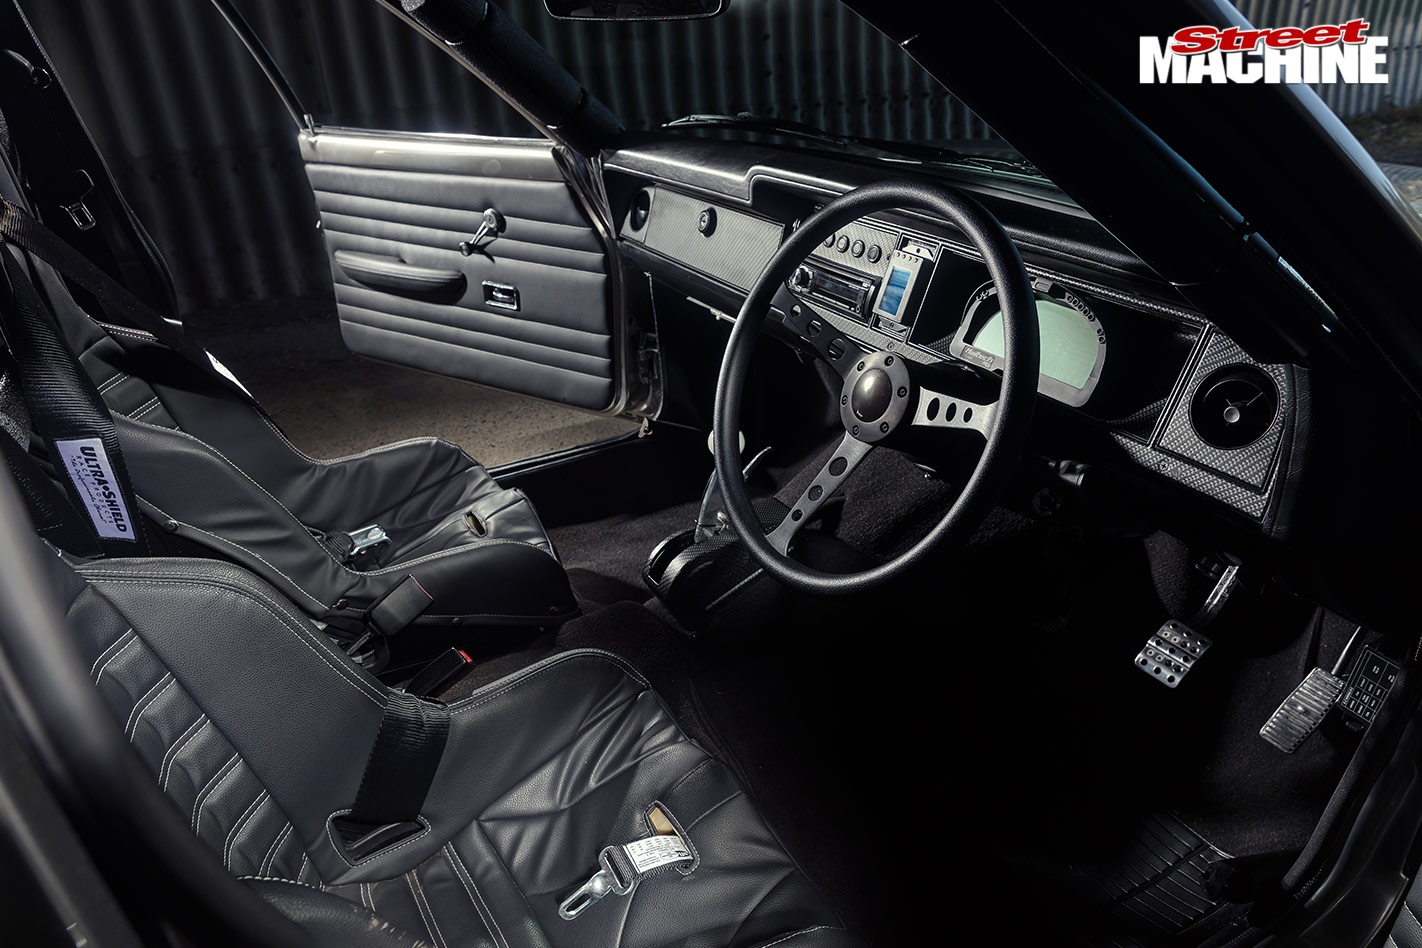 Ford Cortina interior front